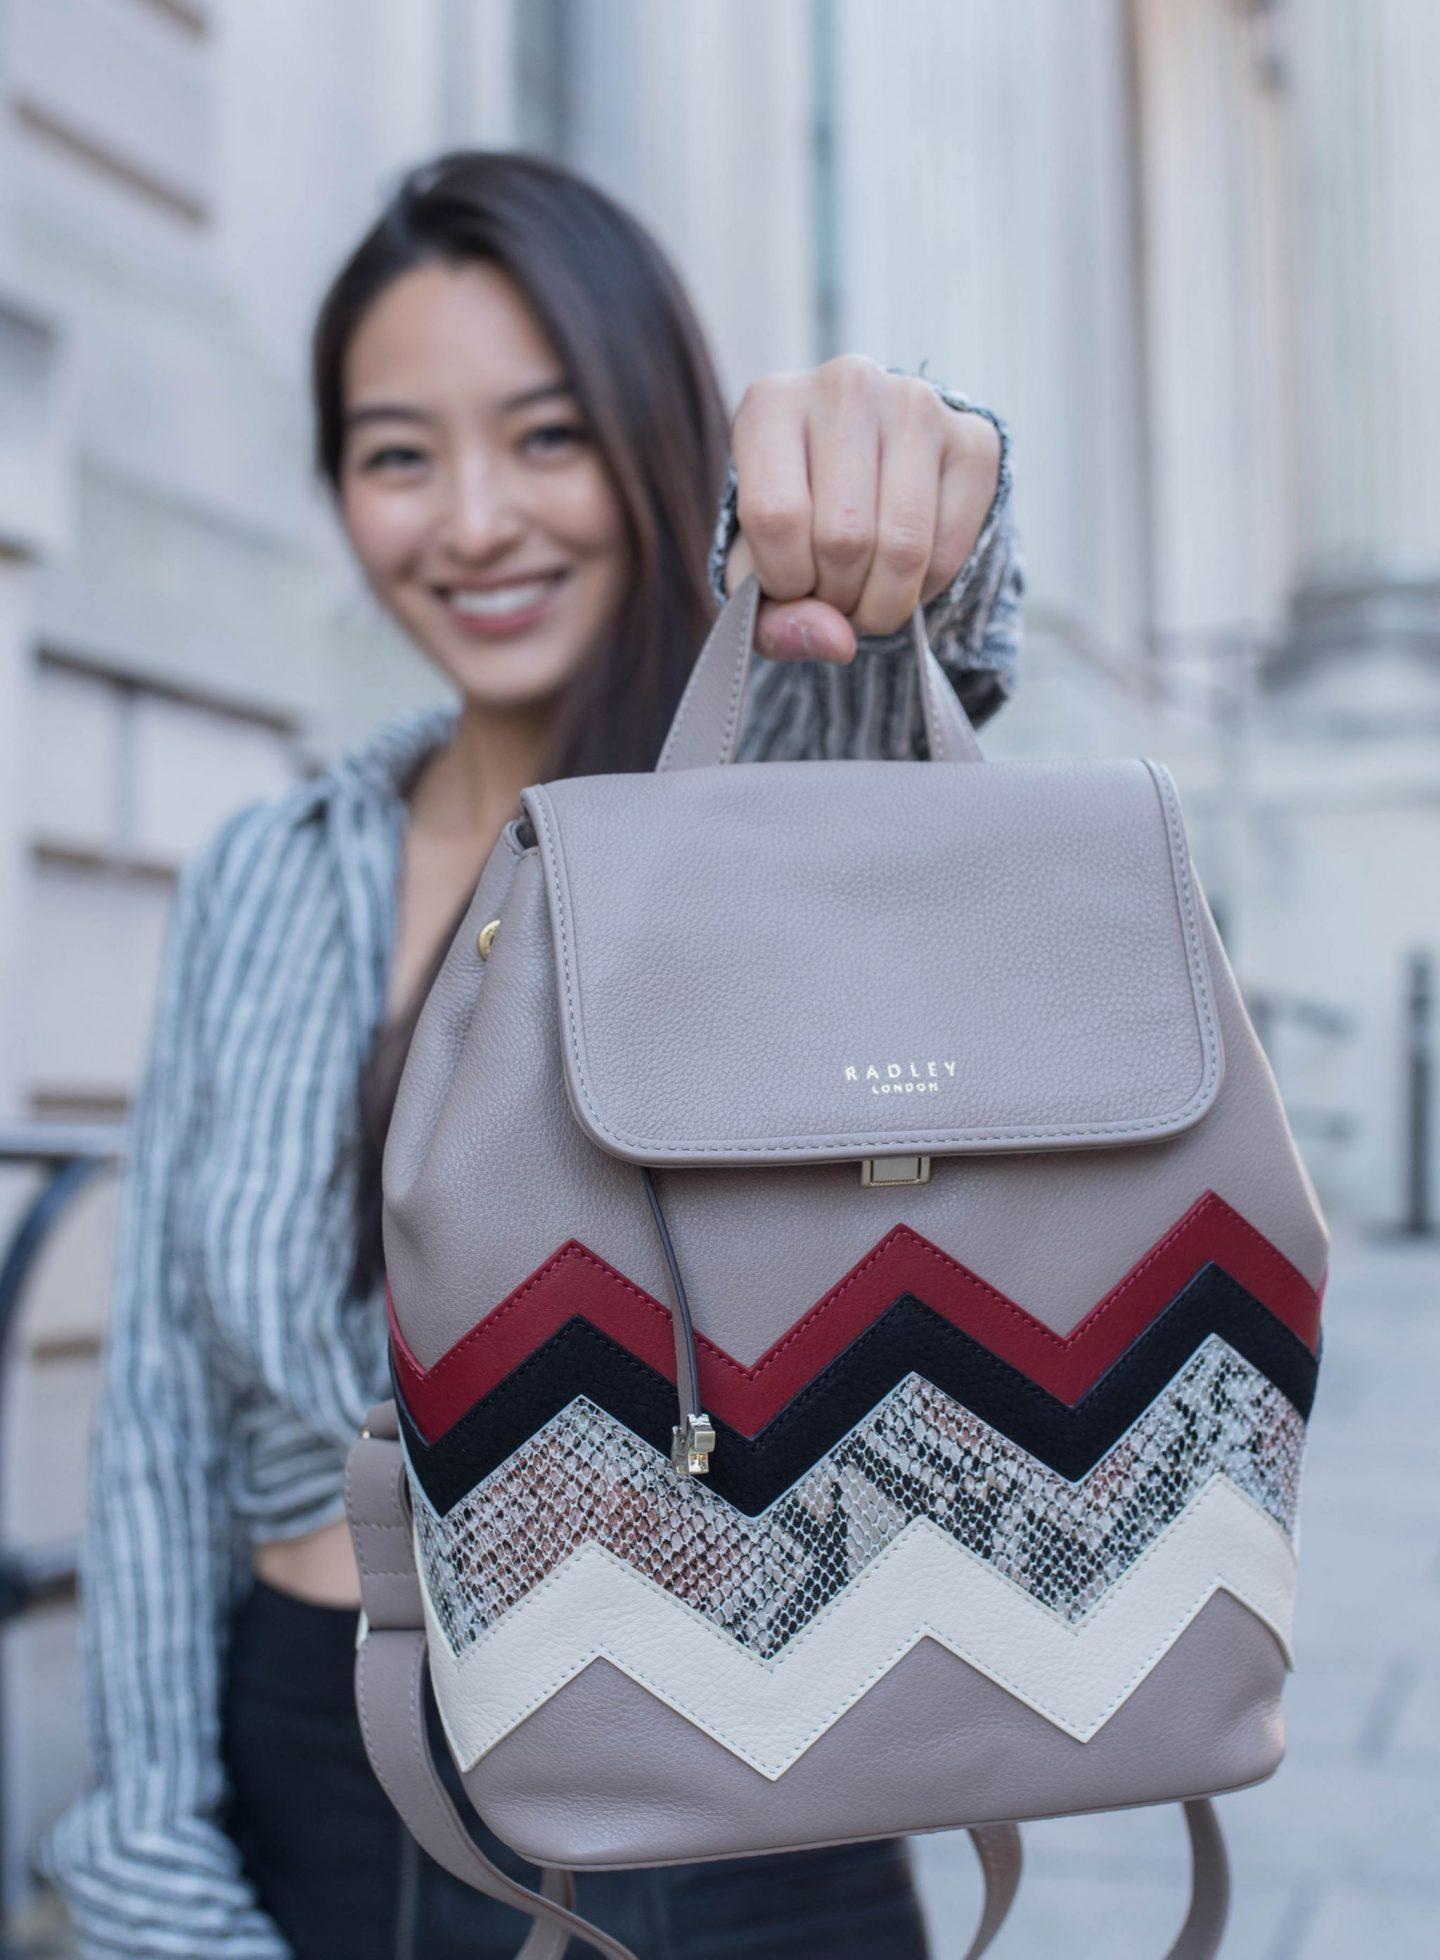 Radley London Bags